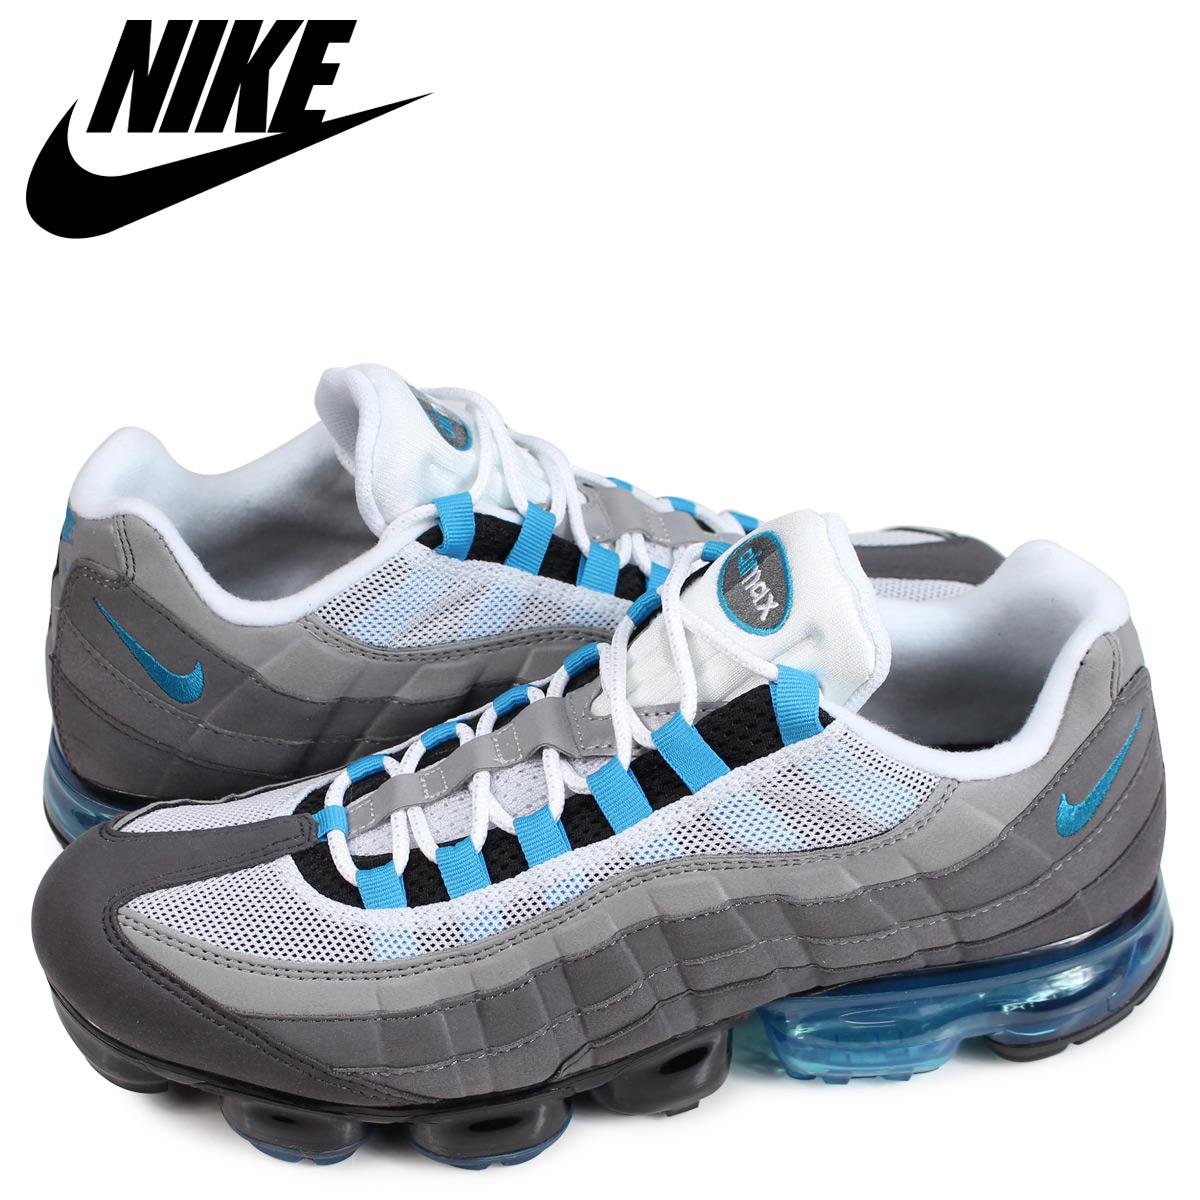 check out 355af 7691d NIKE Nike vapor max 95 sneakers men AIR VAPORMAX 95 black black AJ7292-002